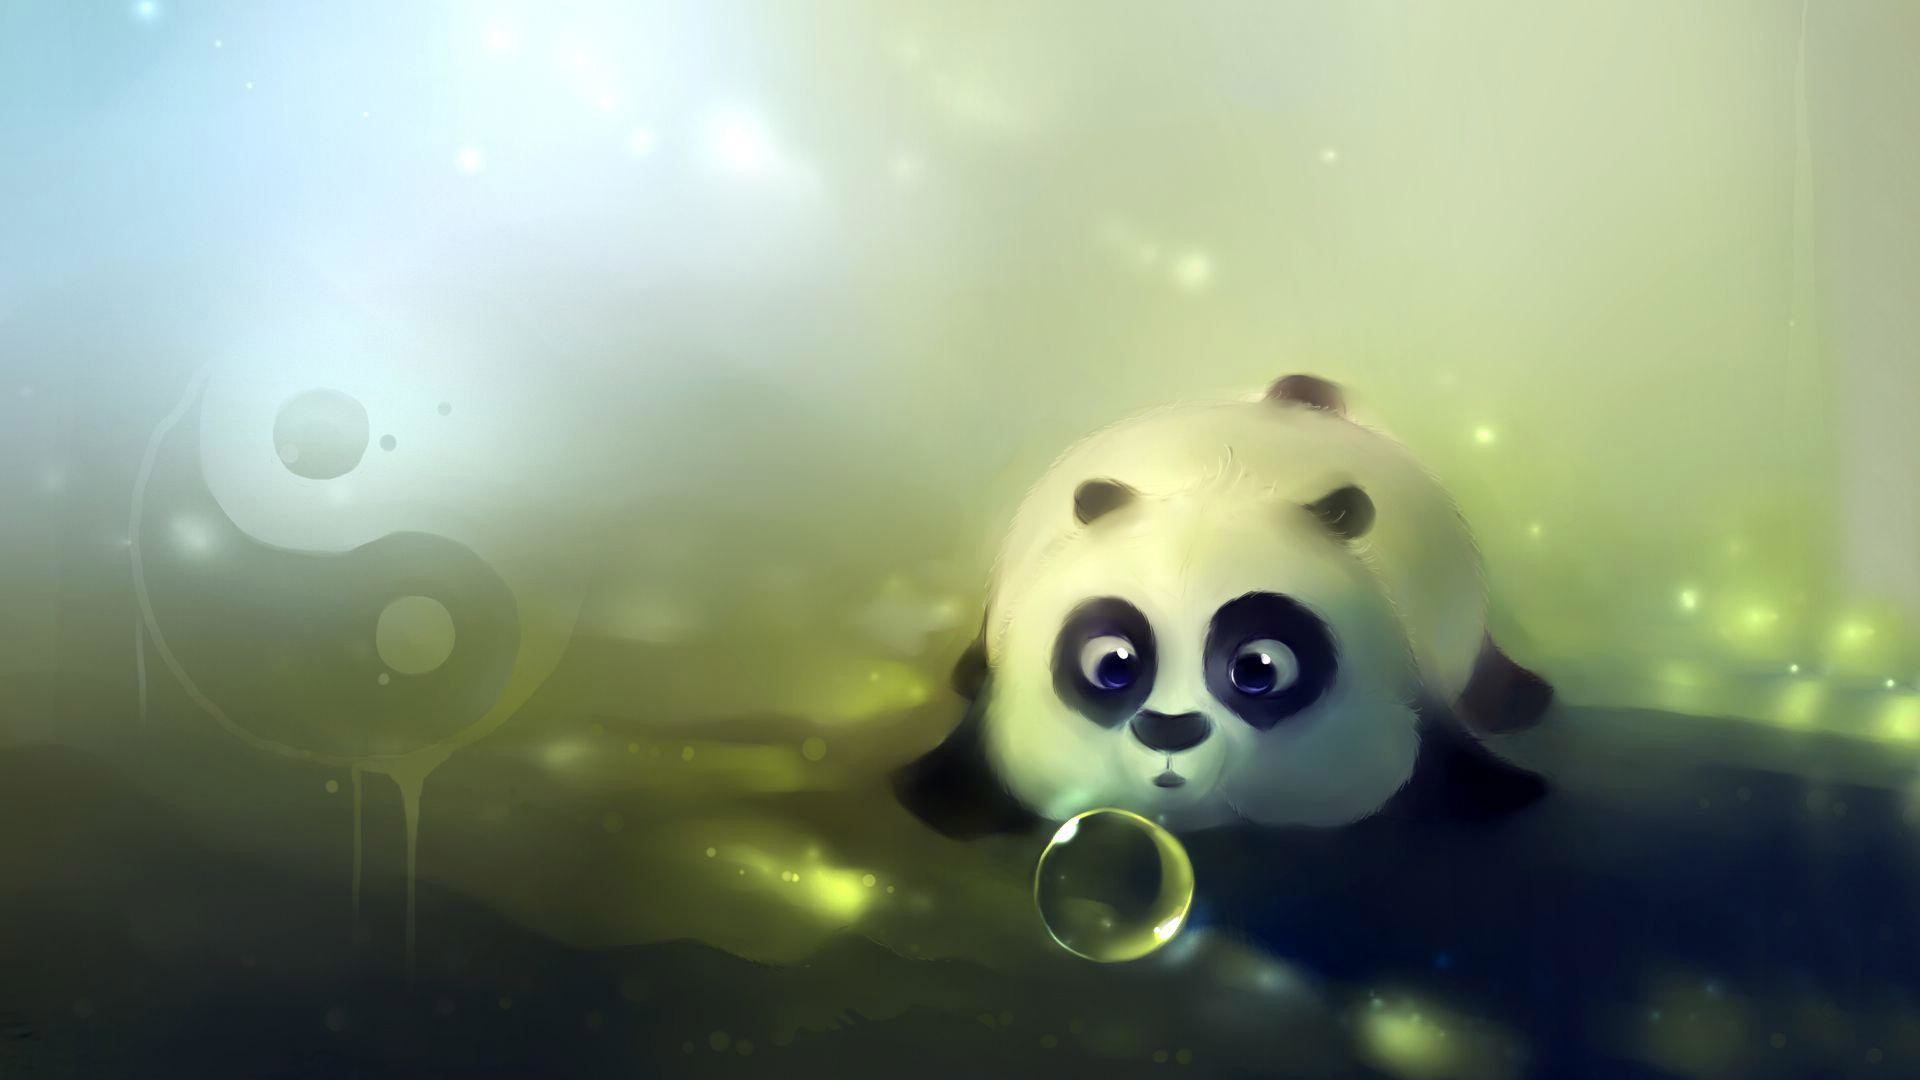 … panda cartoon wallpaper hd image gallery hcpr; cute …